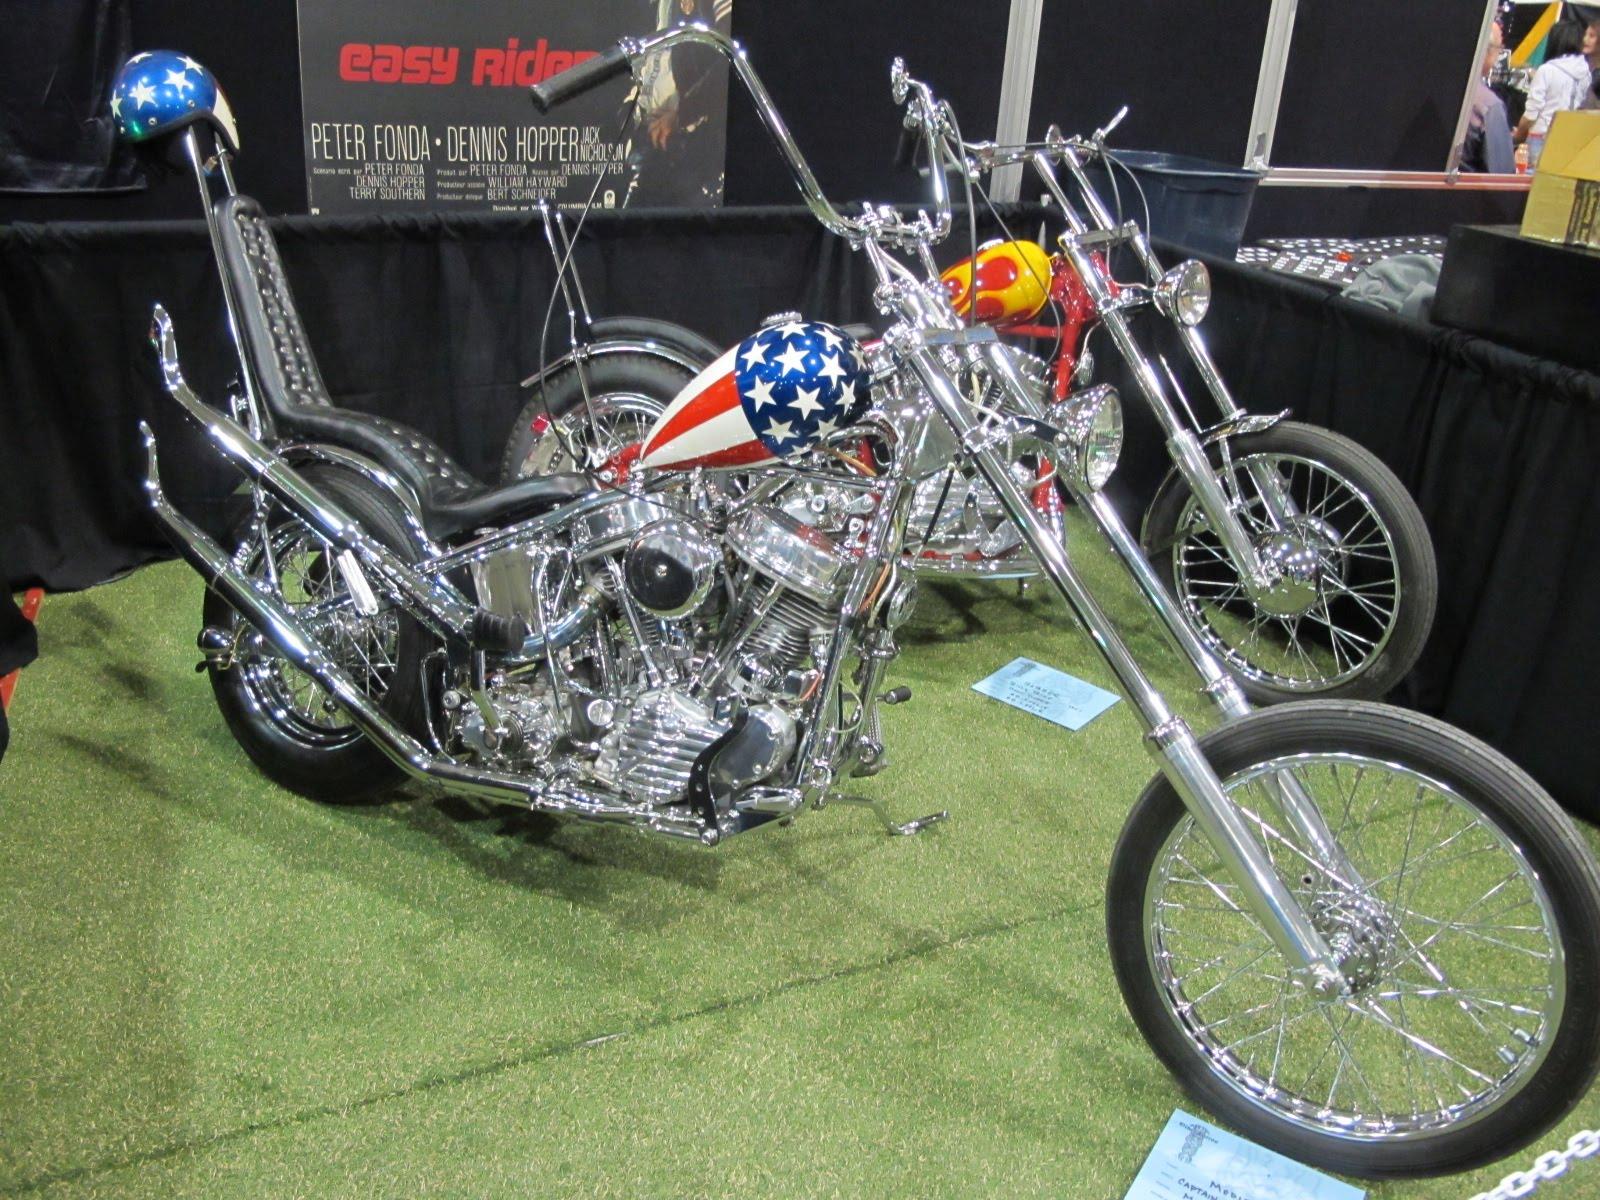 http://4.bp.blogspot.com/-fqsFIaeLTiw/TaxEywYGDKI/AAAAAAAAE50/gQ93oHnS59Y/s1600/Harley+Davidson+show+laval+15-16-17+avril+2011+010.jpg